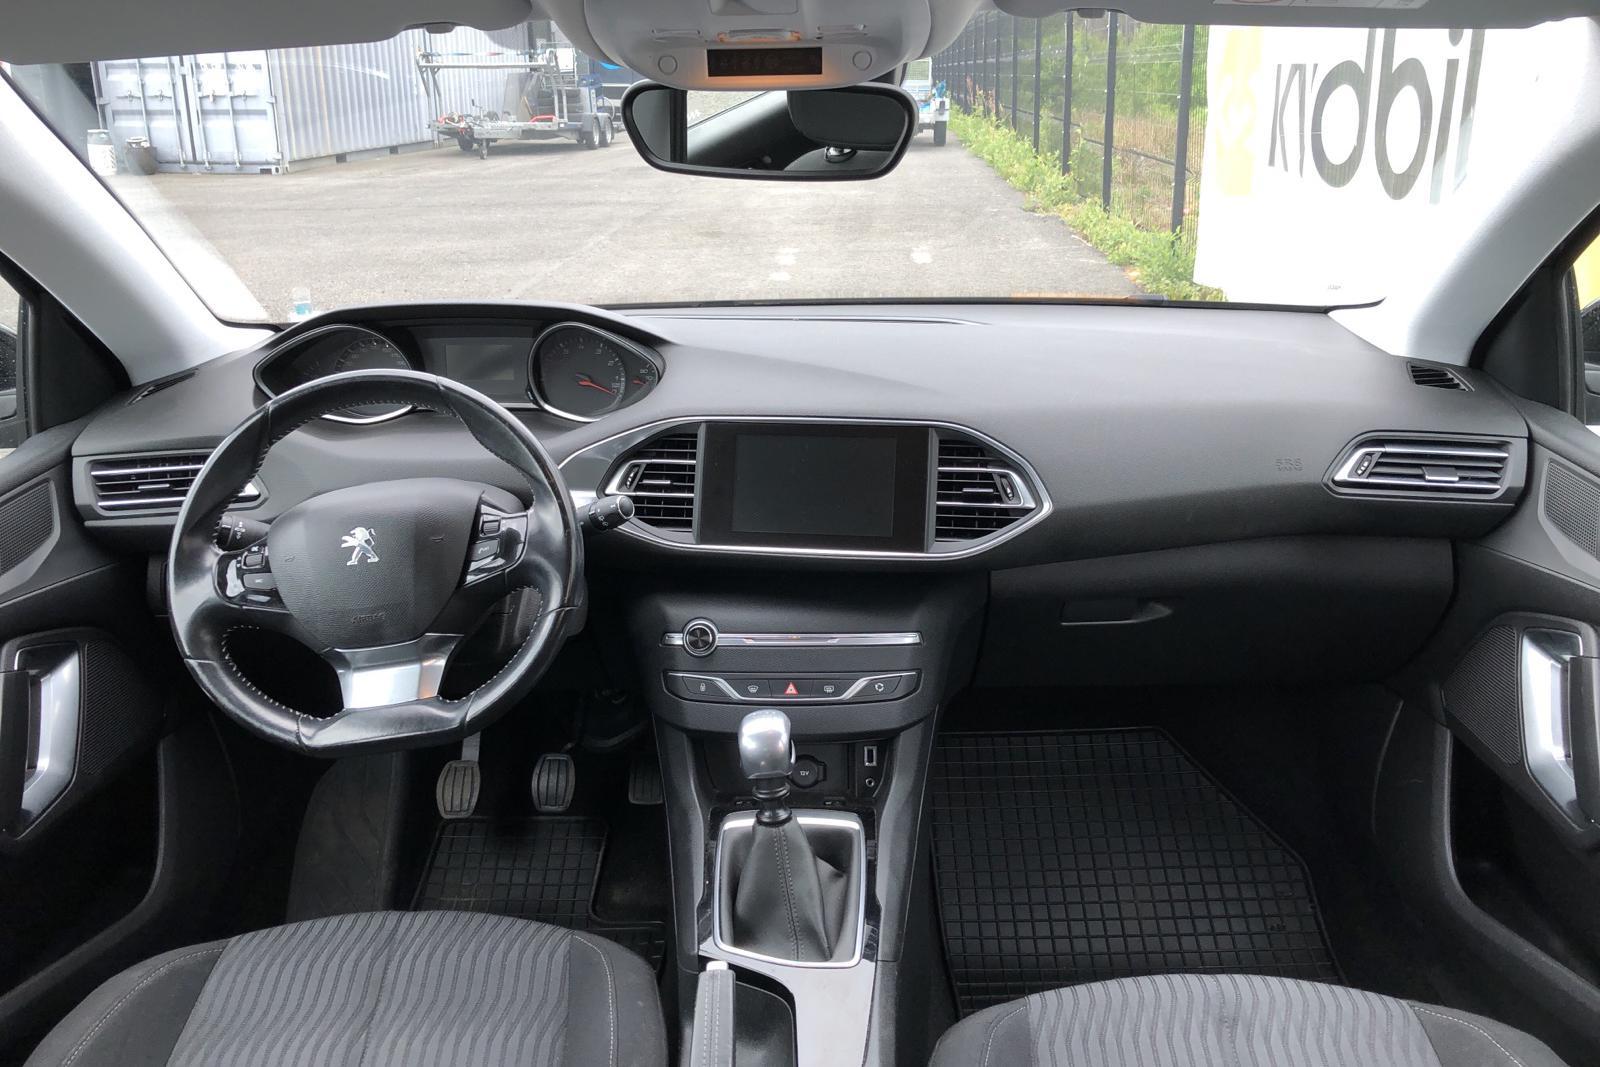 Peugeot 308 SW PureTech (130hk) - 74 320 km - Manual - black - 2015